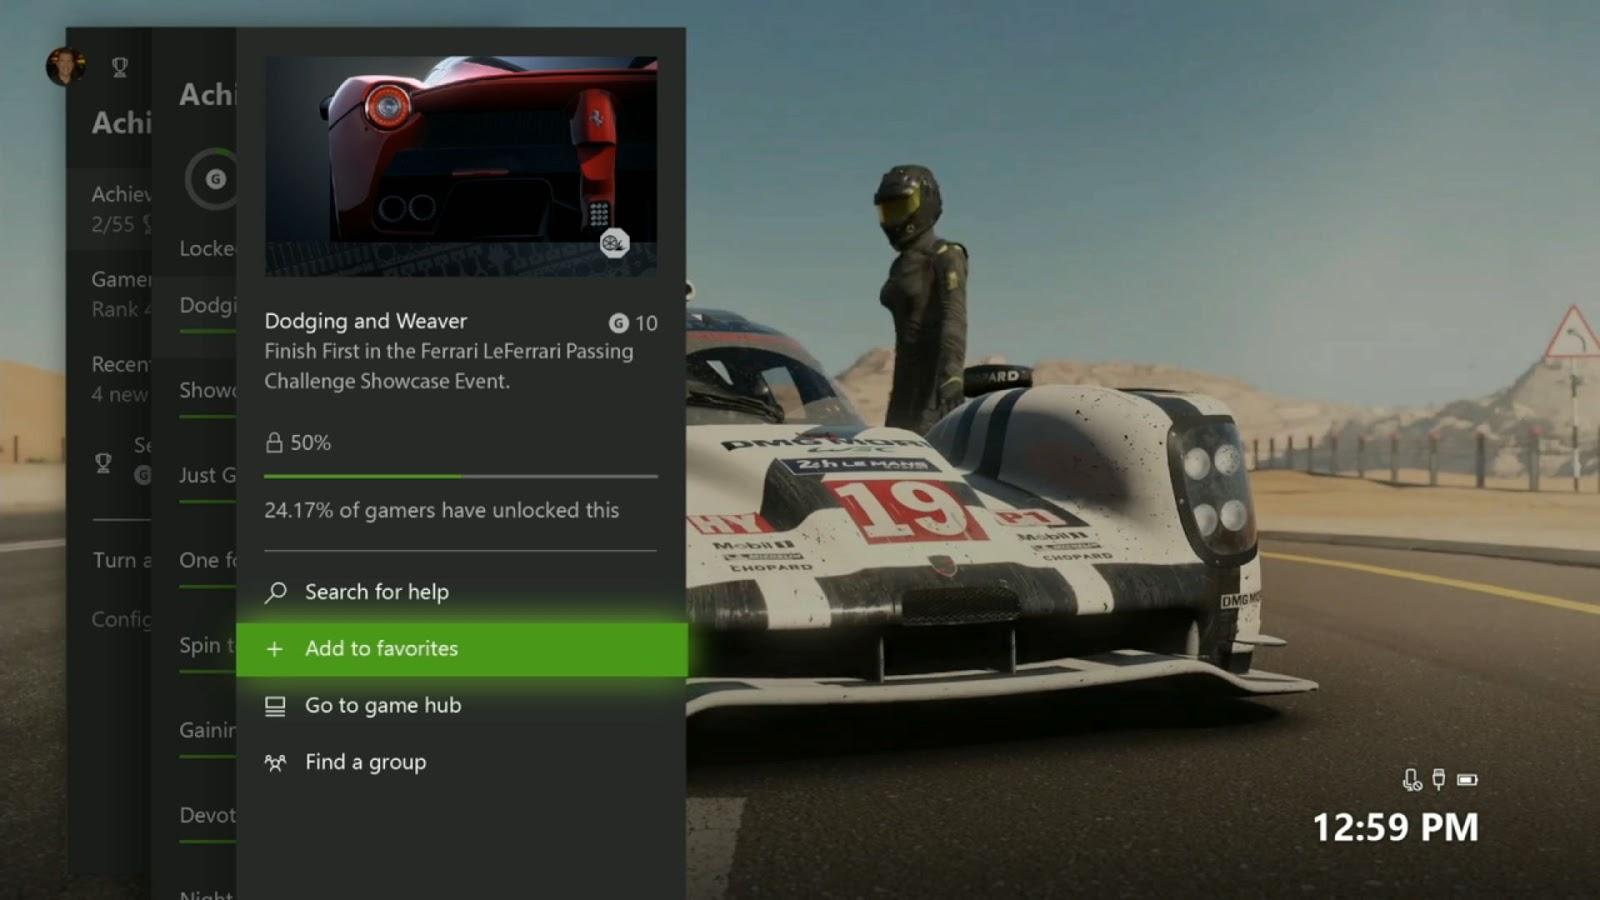 XboxOneUI-9.jpg